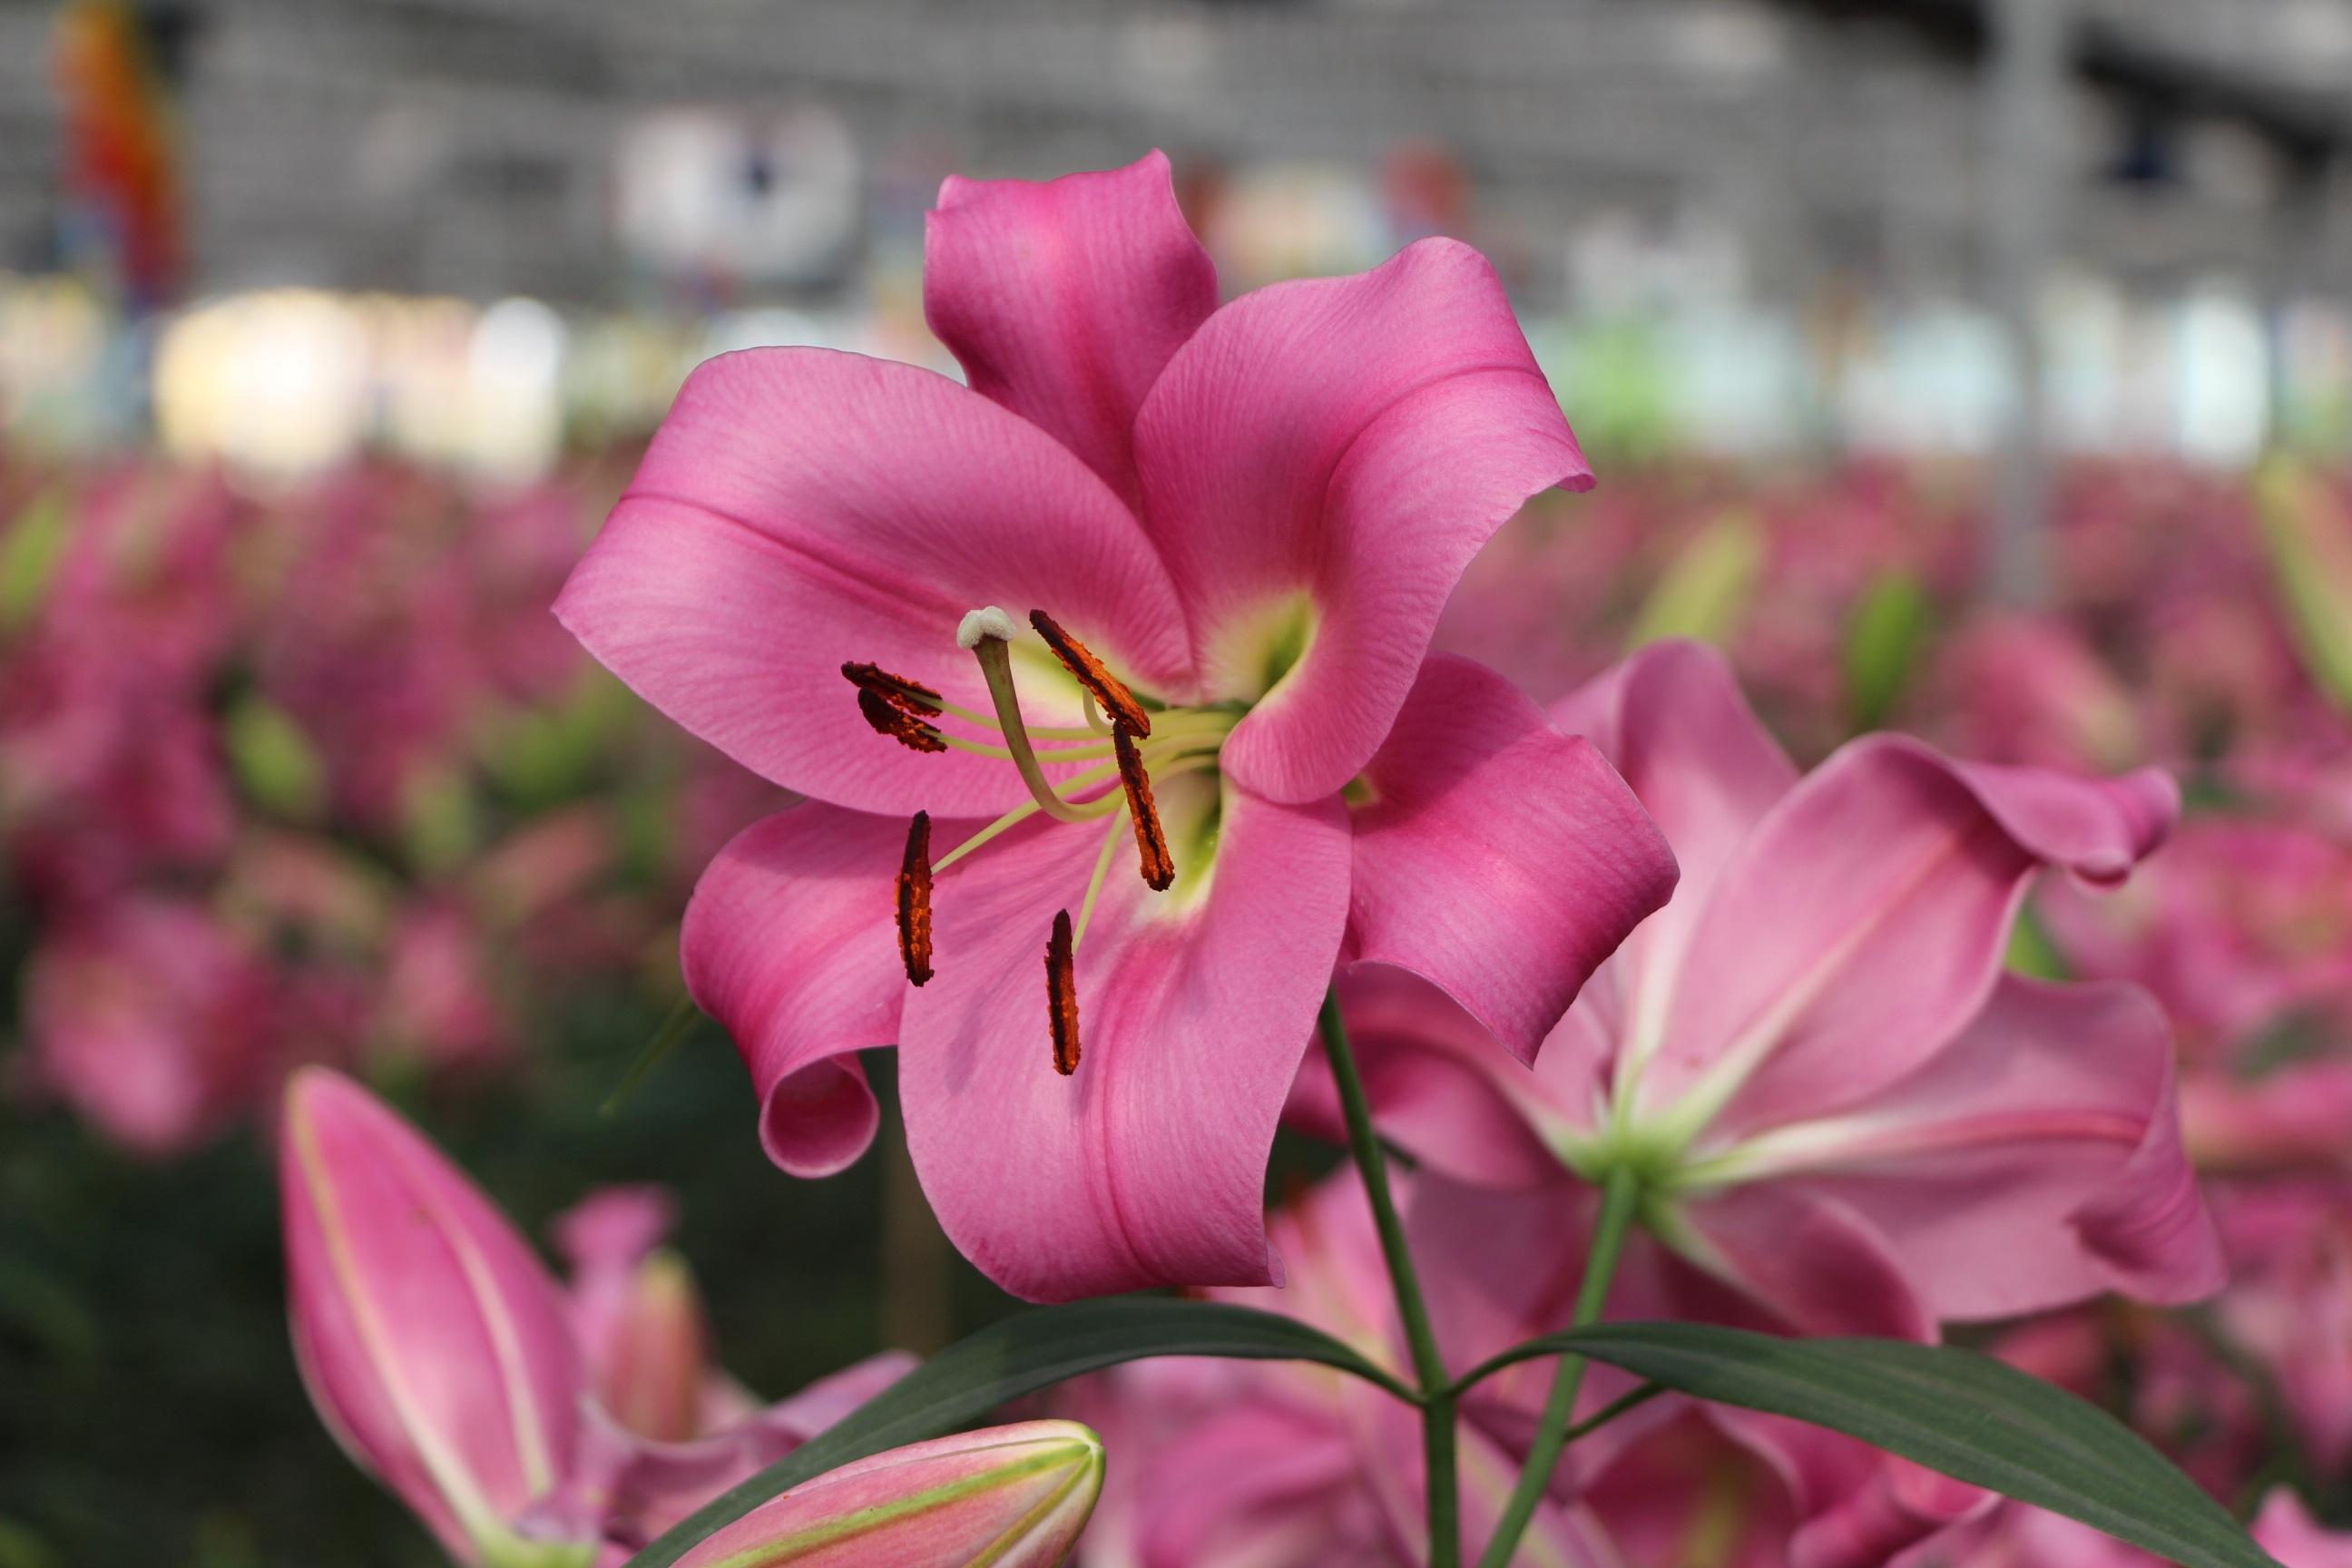 1000 Beautiful Single Flower Photos Pexels Free Stock: Free Images : Blossom, Flower, Petal, Summer, Tulip